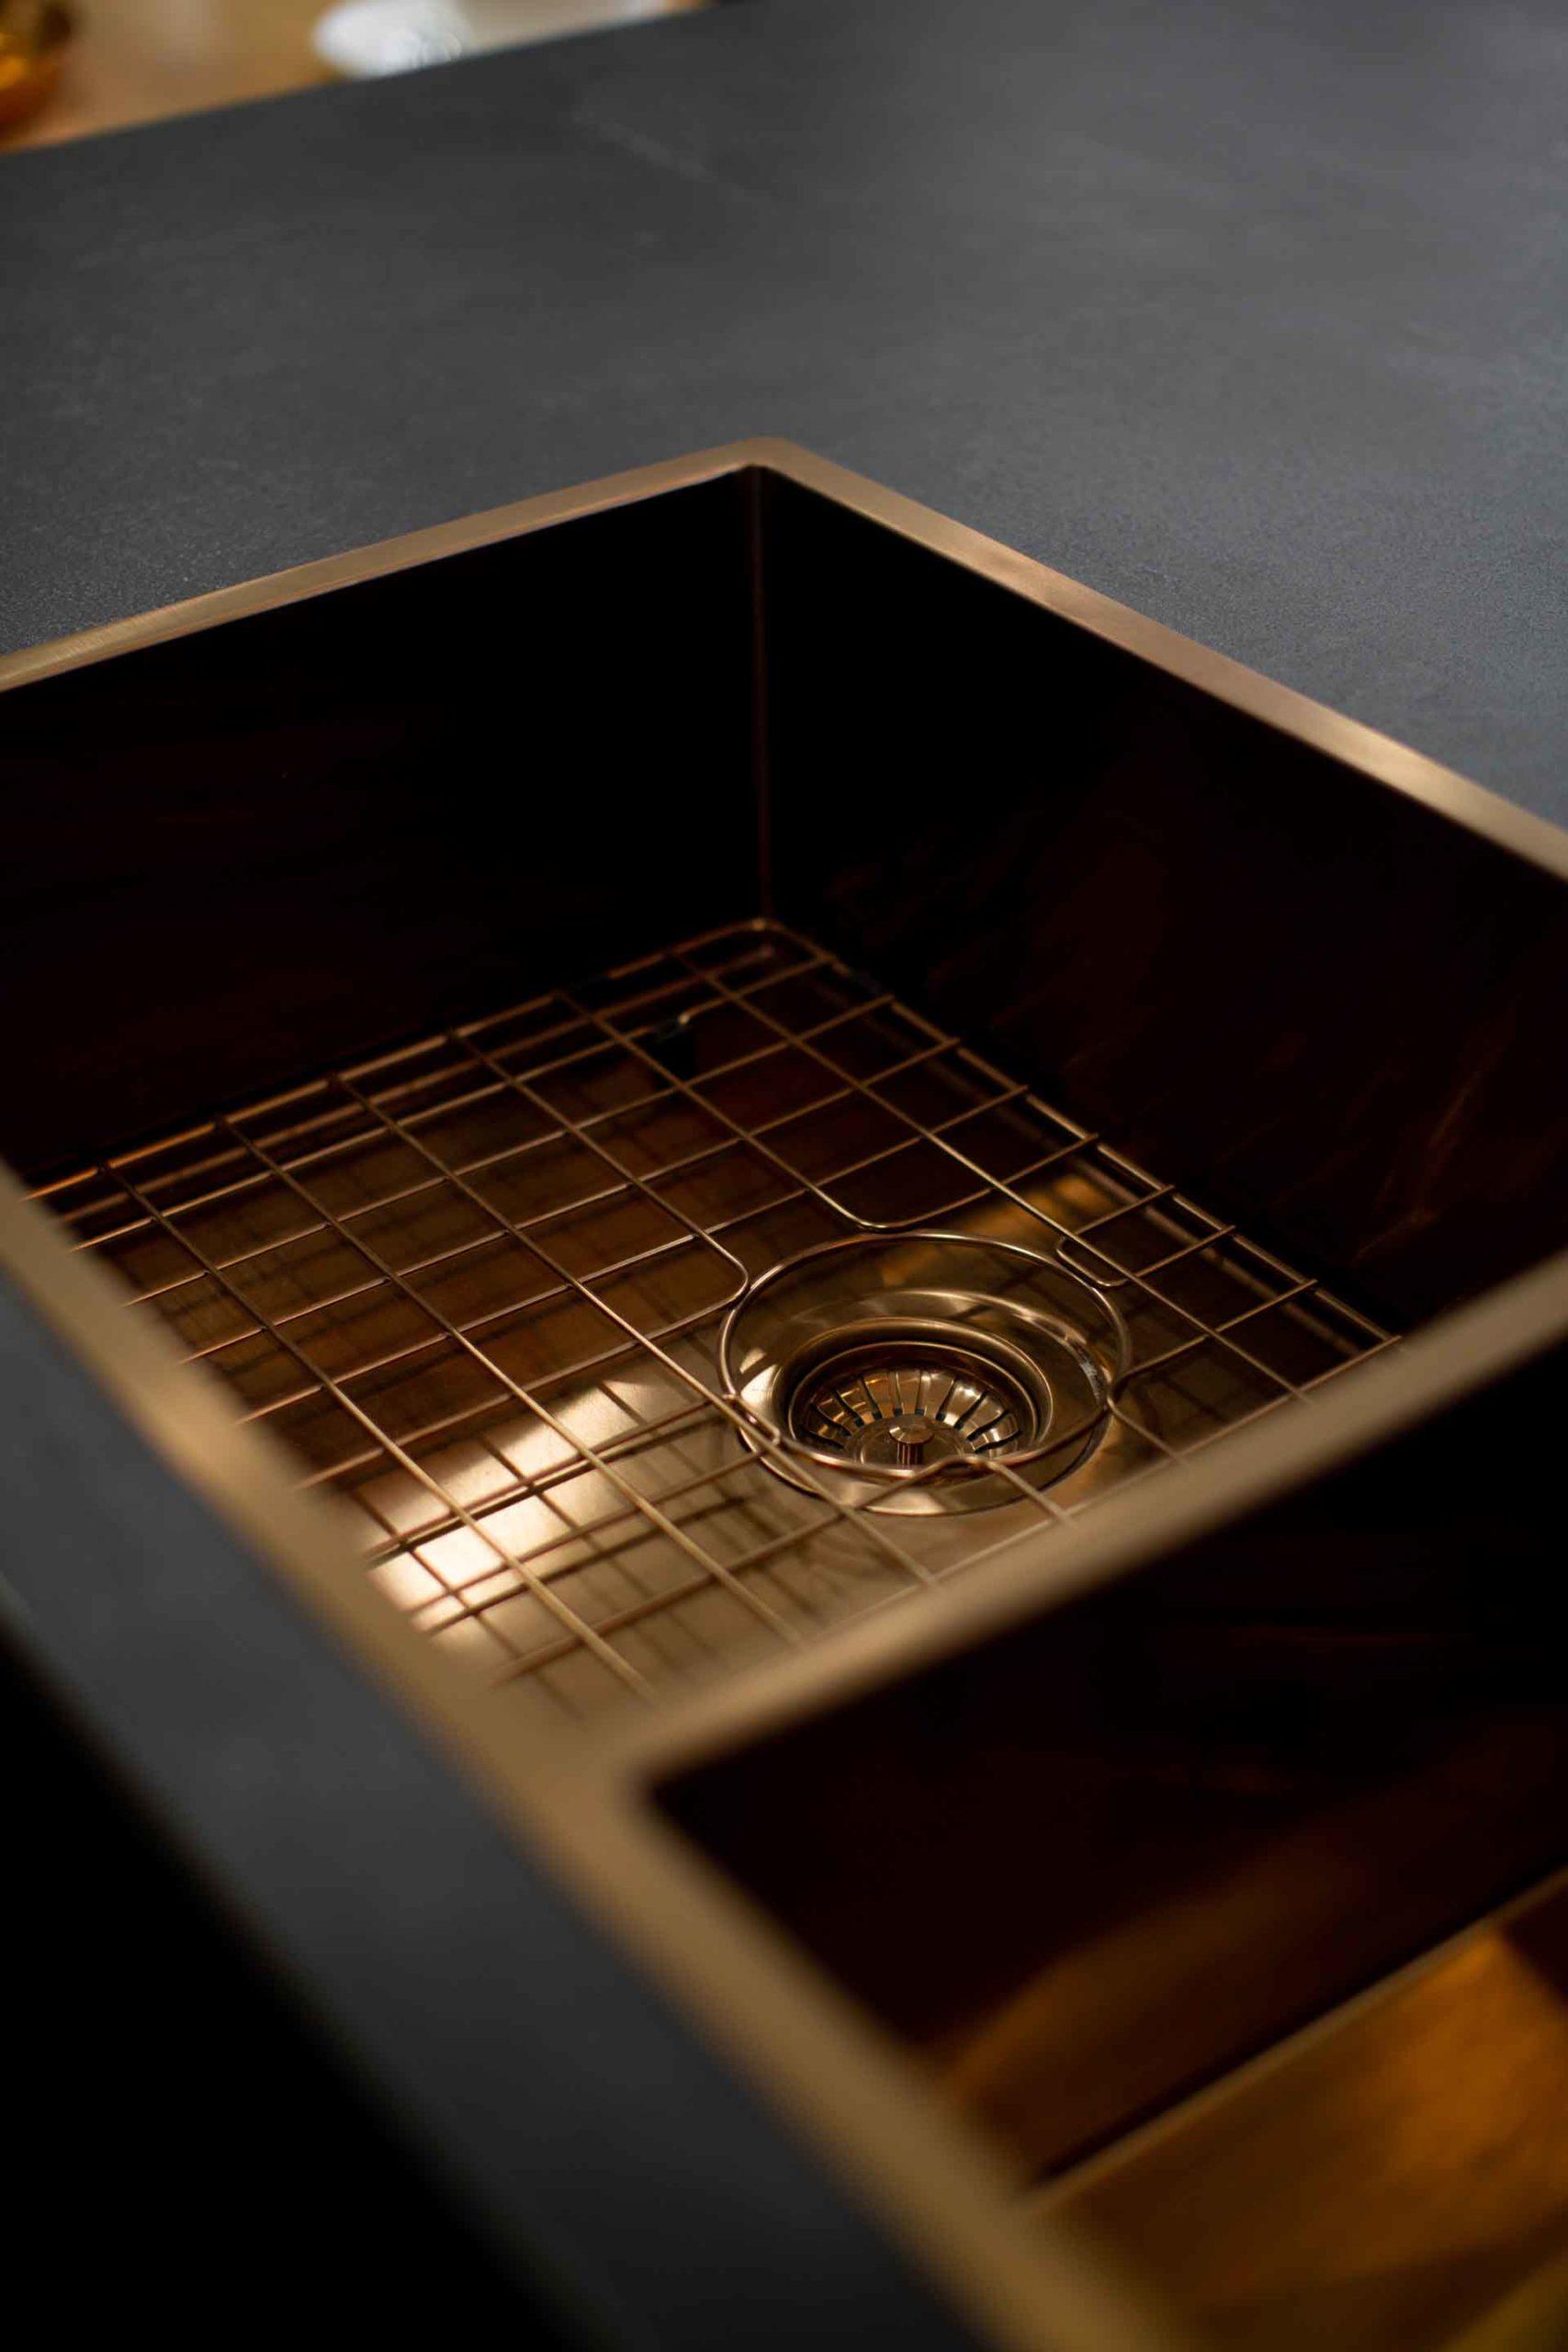 Leopard_Lens_Photography_Inarc_Design_Simson_Kitchen_Showroom-46